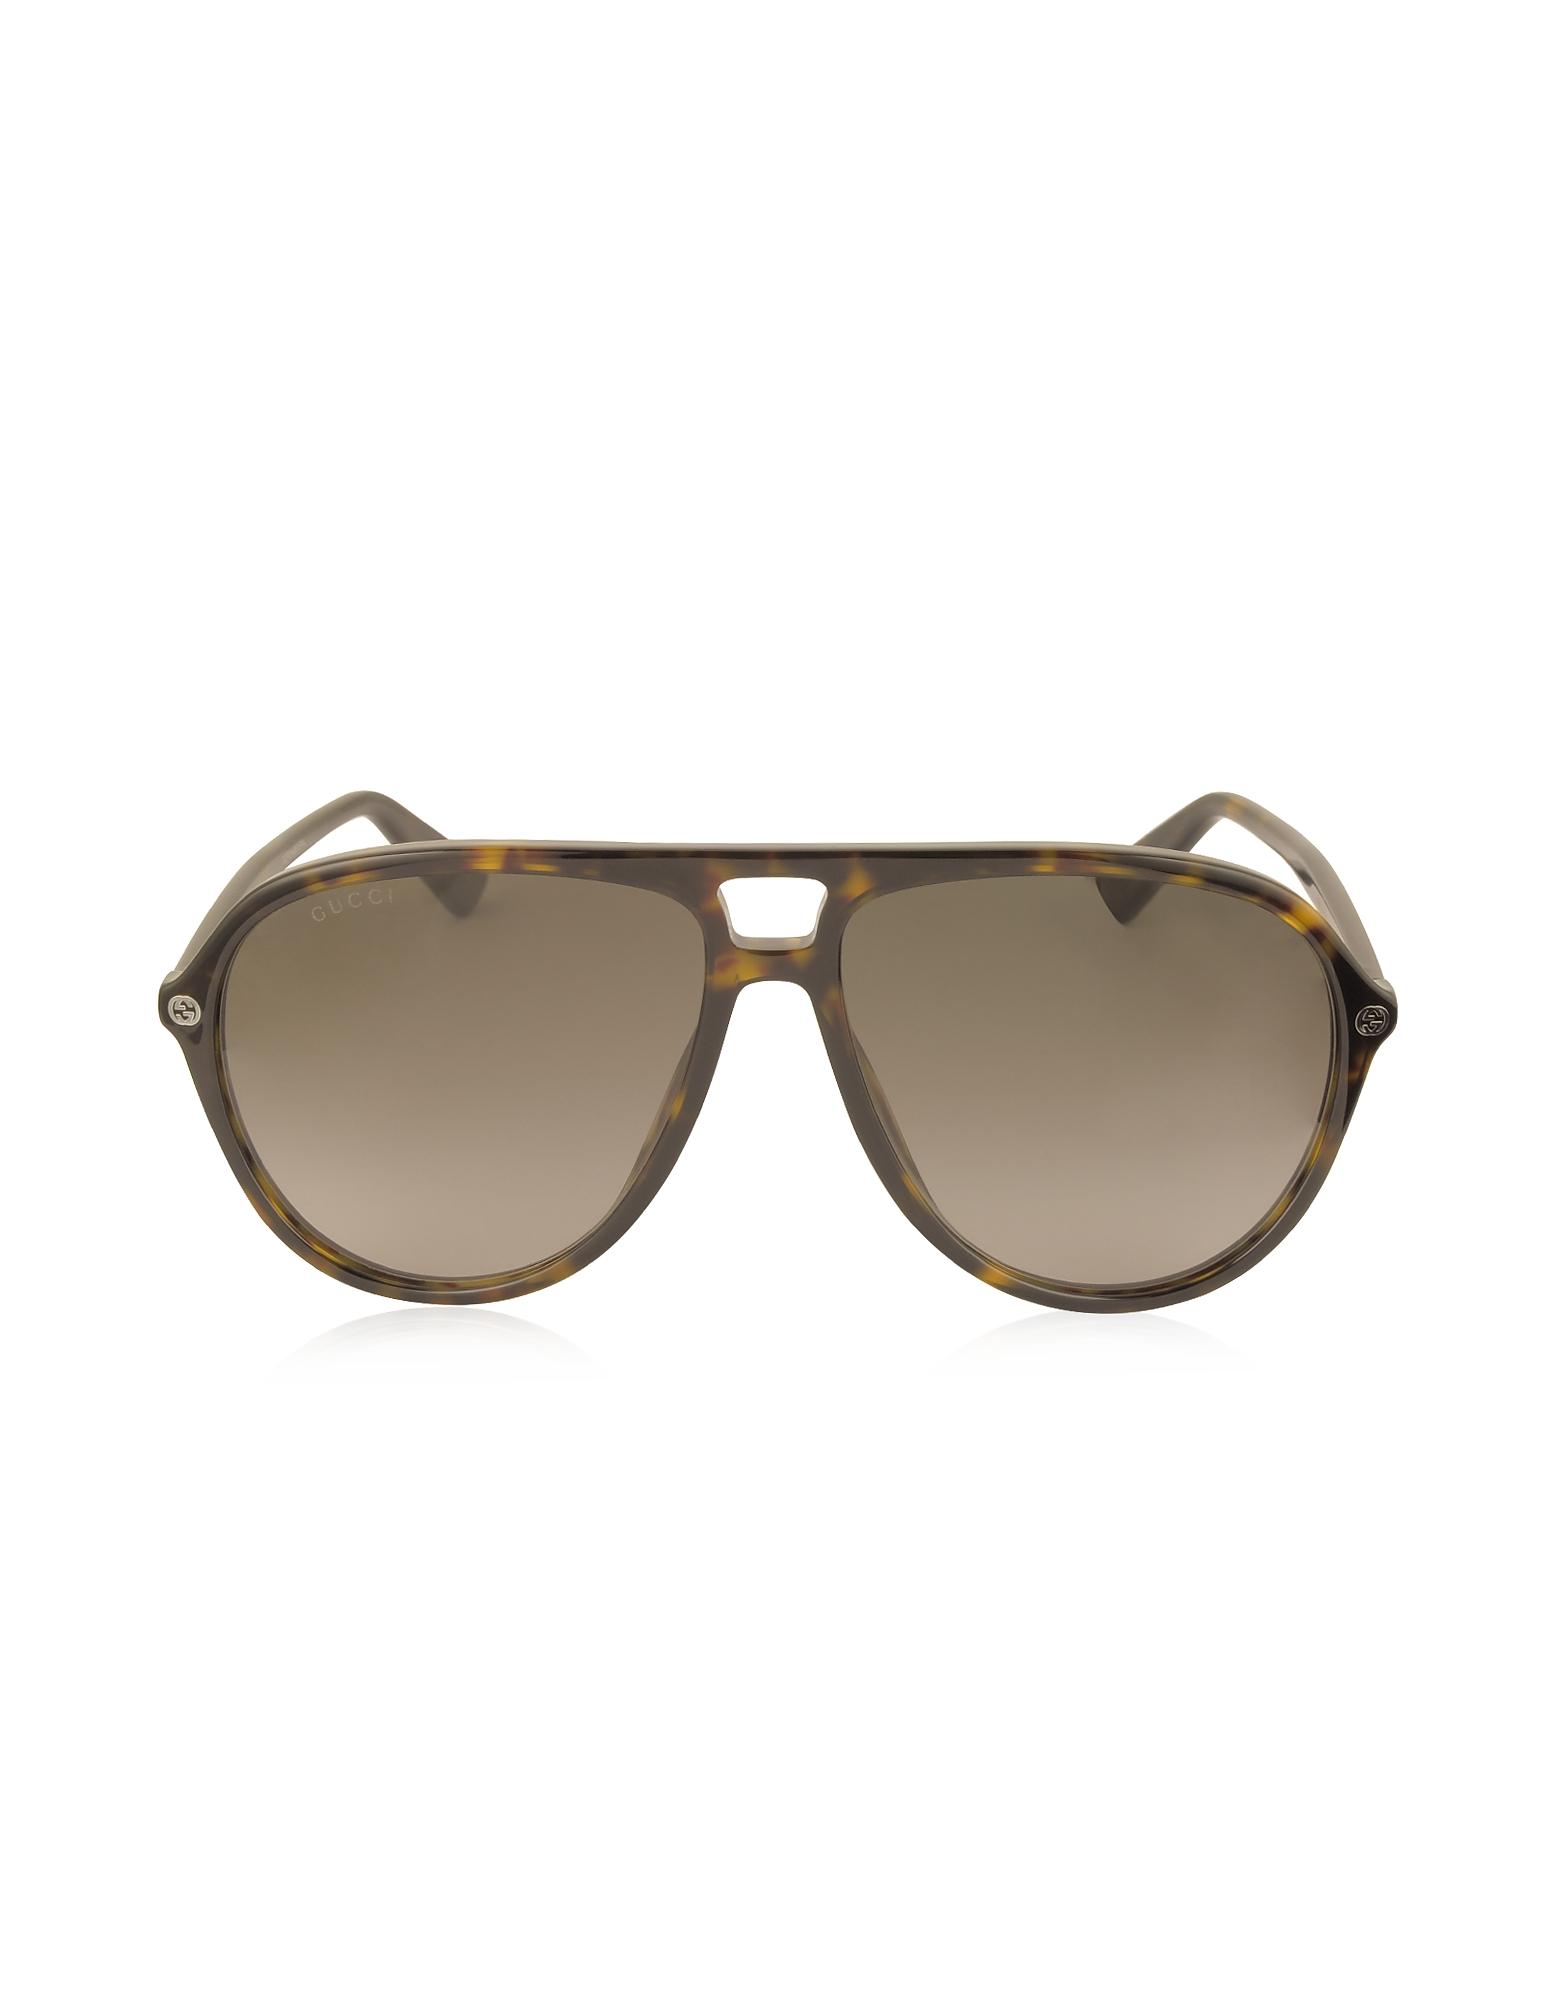 Gucci Sunglasses, GG0119S Acetate Aviator Men's Sunglasses